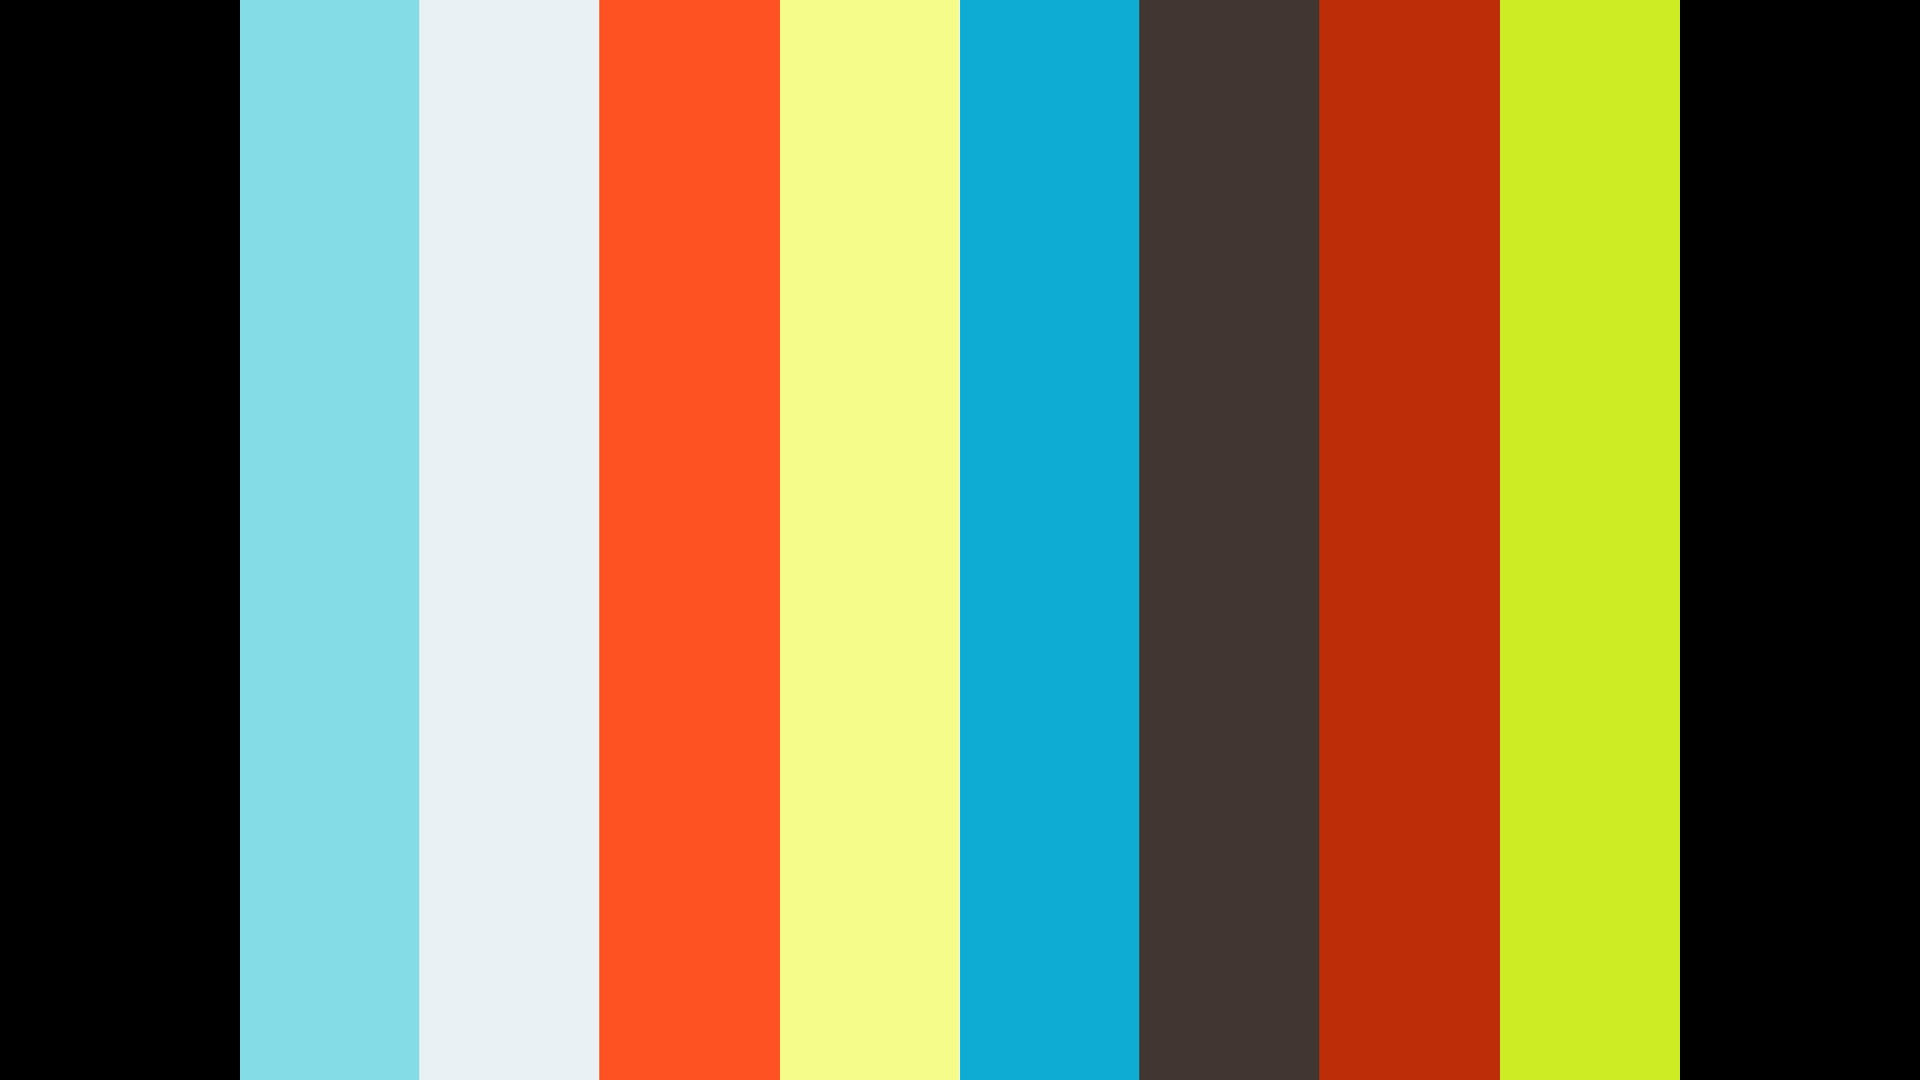 2020-05-21 ILOT TIAMBOUEN - FLOSS